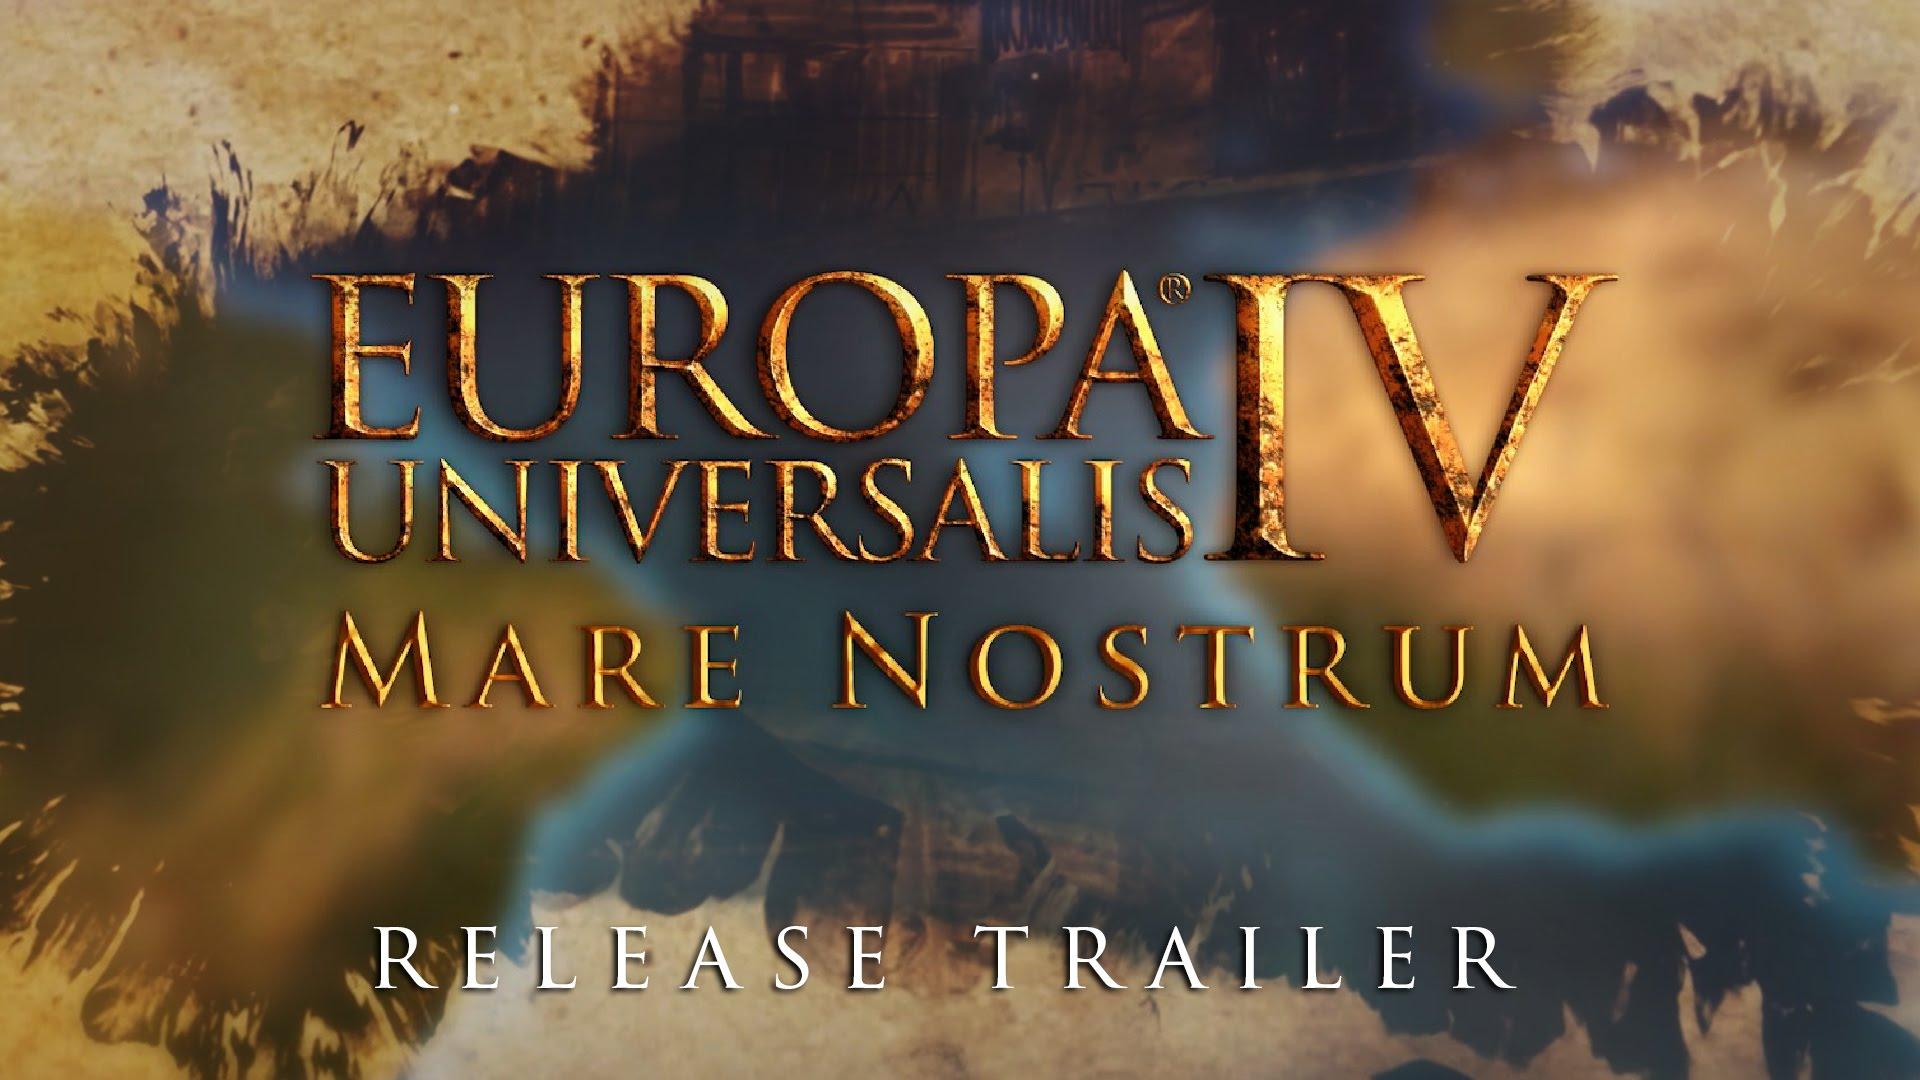 Europa Universalis IV - Mare Nostrum Release Trailer